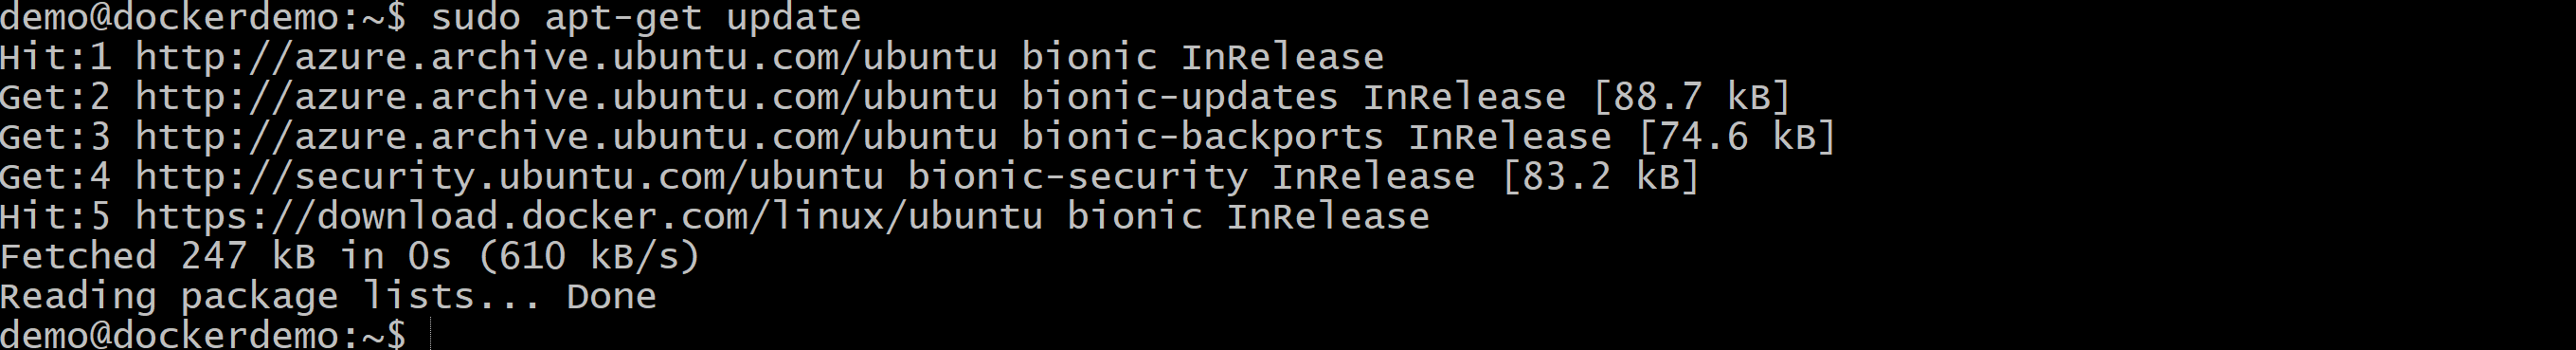 Docker Ubuntu Azure zdj.29